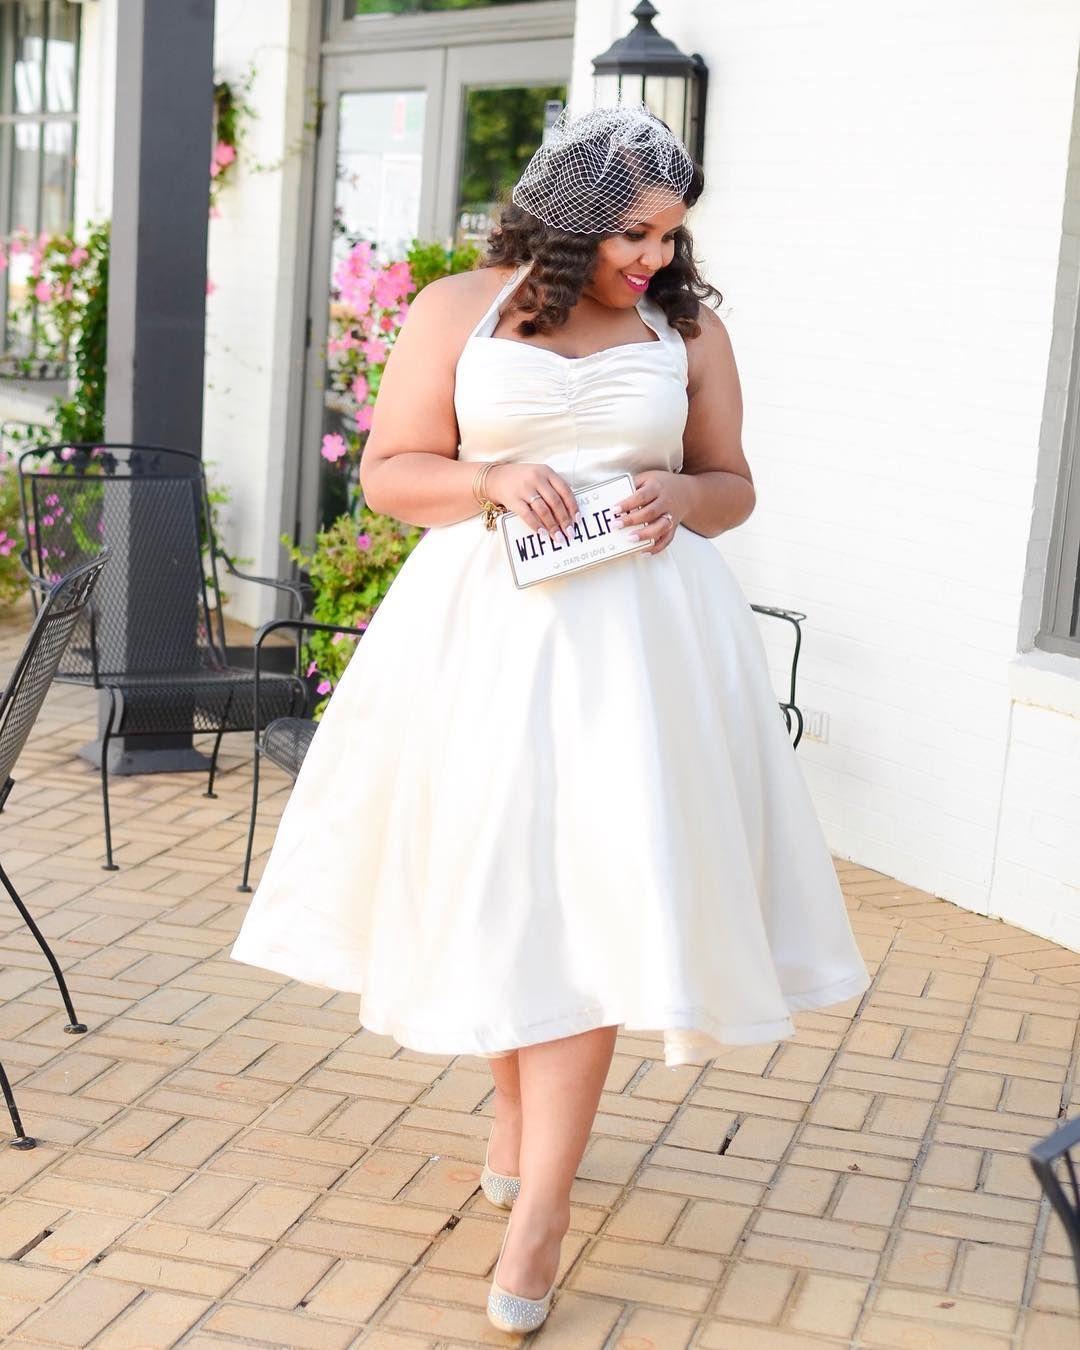 Plus Size Wedding Dress Idea | Lace wedding dress with ...